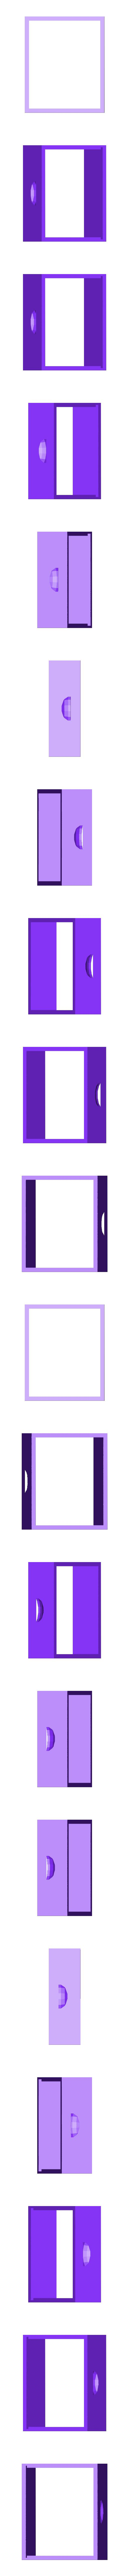 Medium_Box.obj Download free OBJ file Langstroth Beehive Model • Object to 3D print, AlbertKhan3D